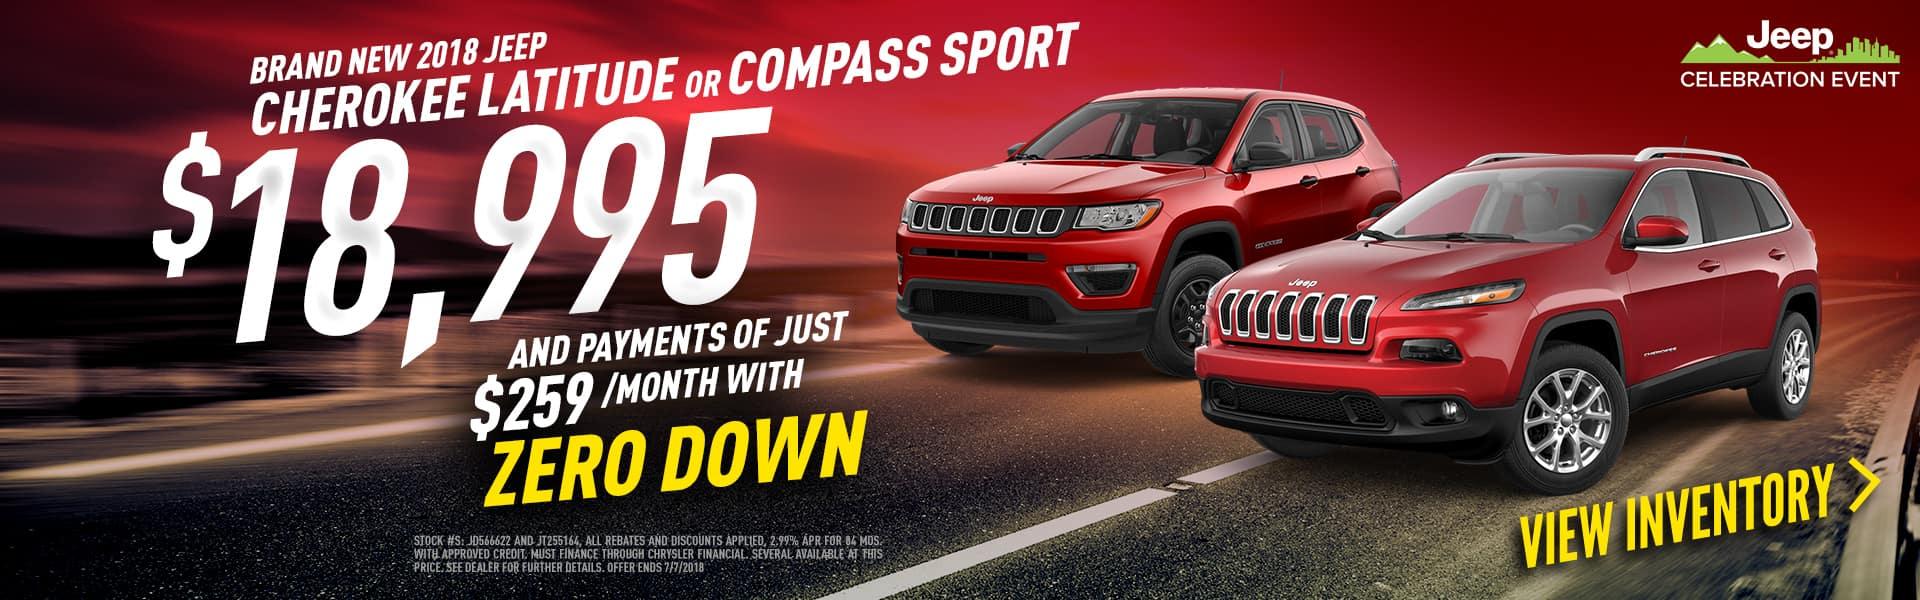 2018-jeep-cherokee-compass-for-sale-bob-howard-cjd